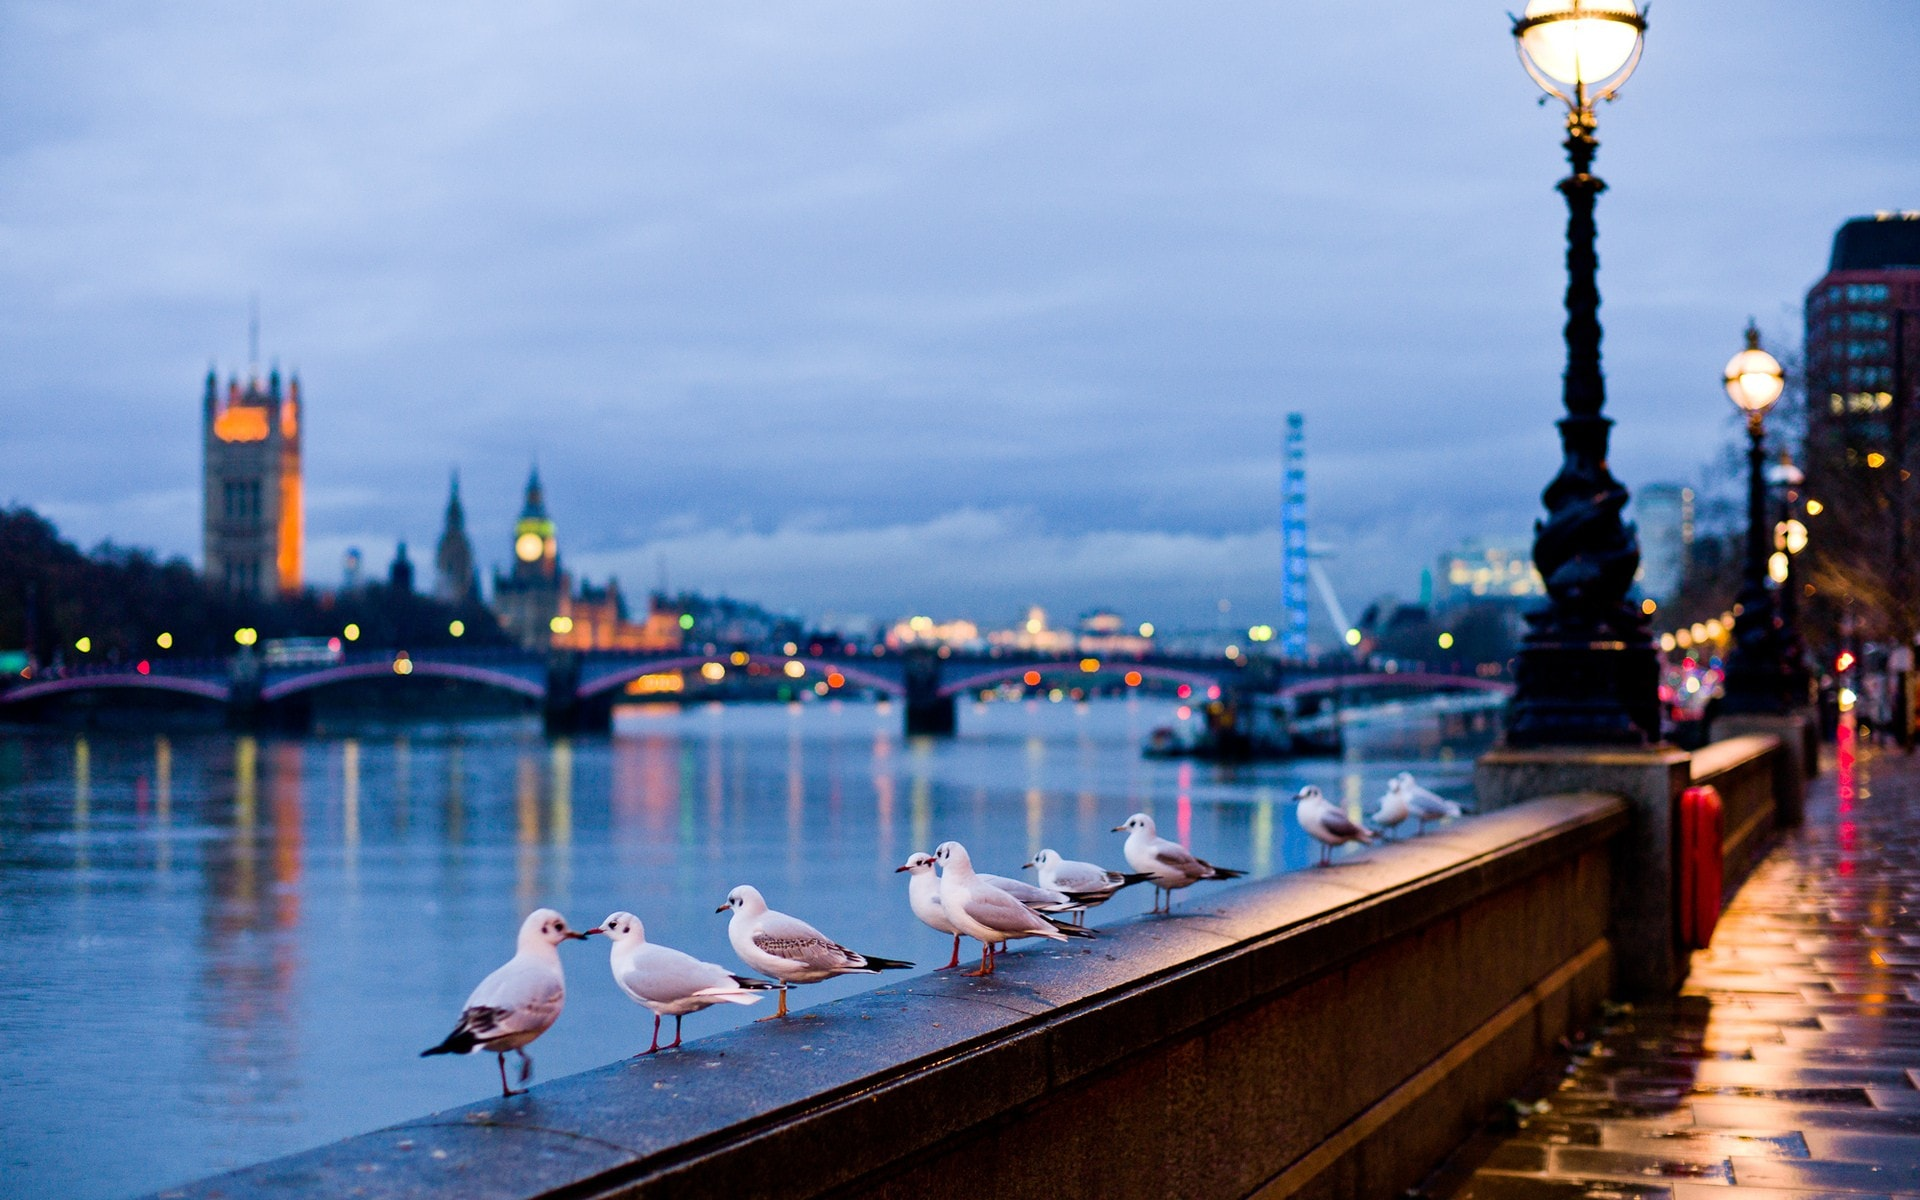 London widescreen for desktop